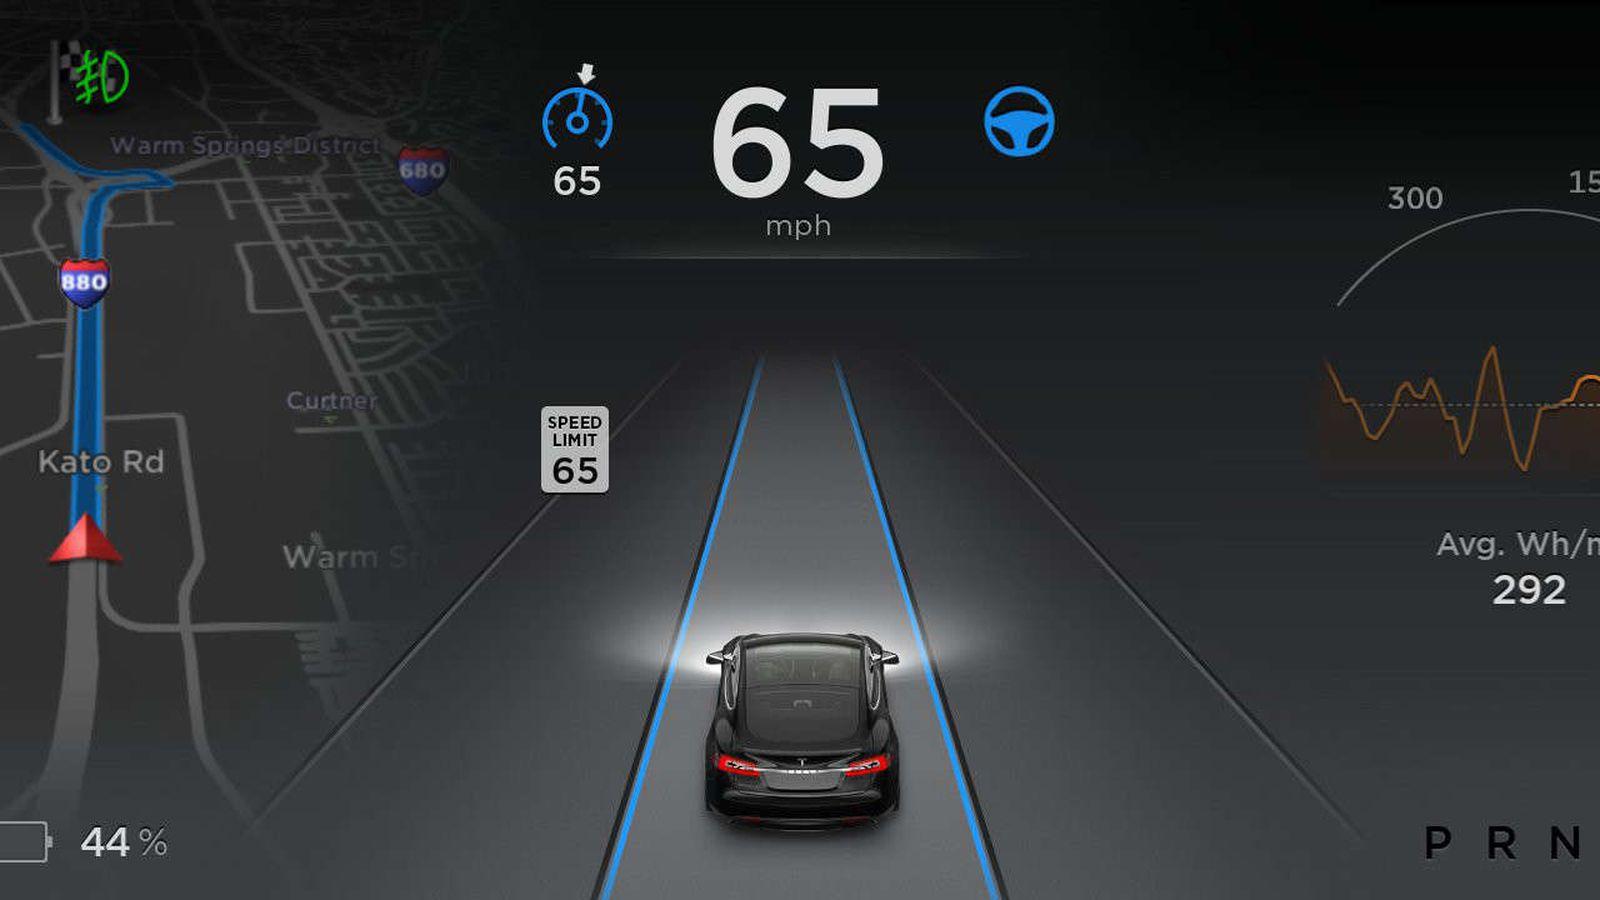 Driver in Fatal Tesla Autopilot Crash Had Seven Seconds to Take Action